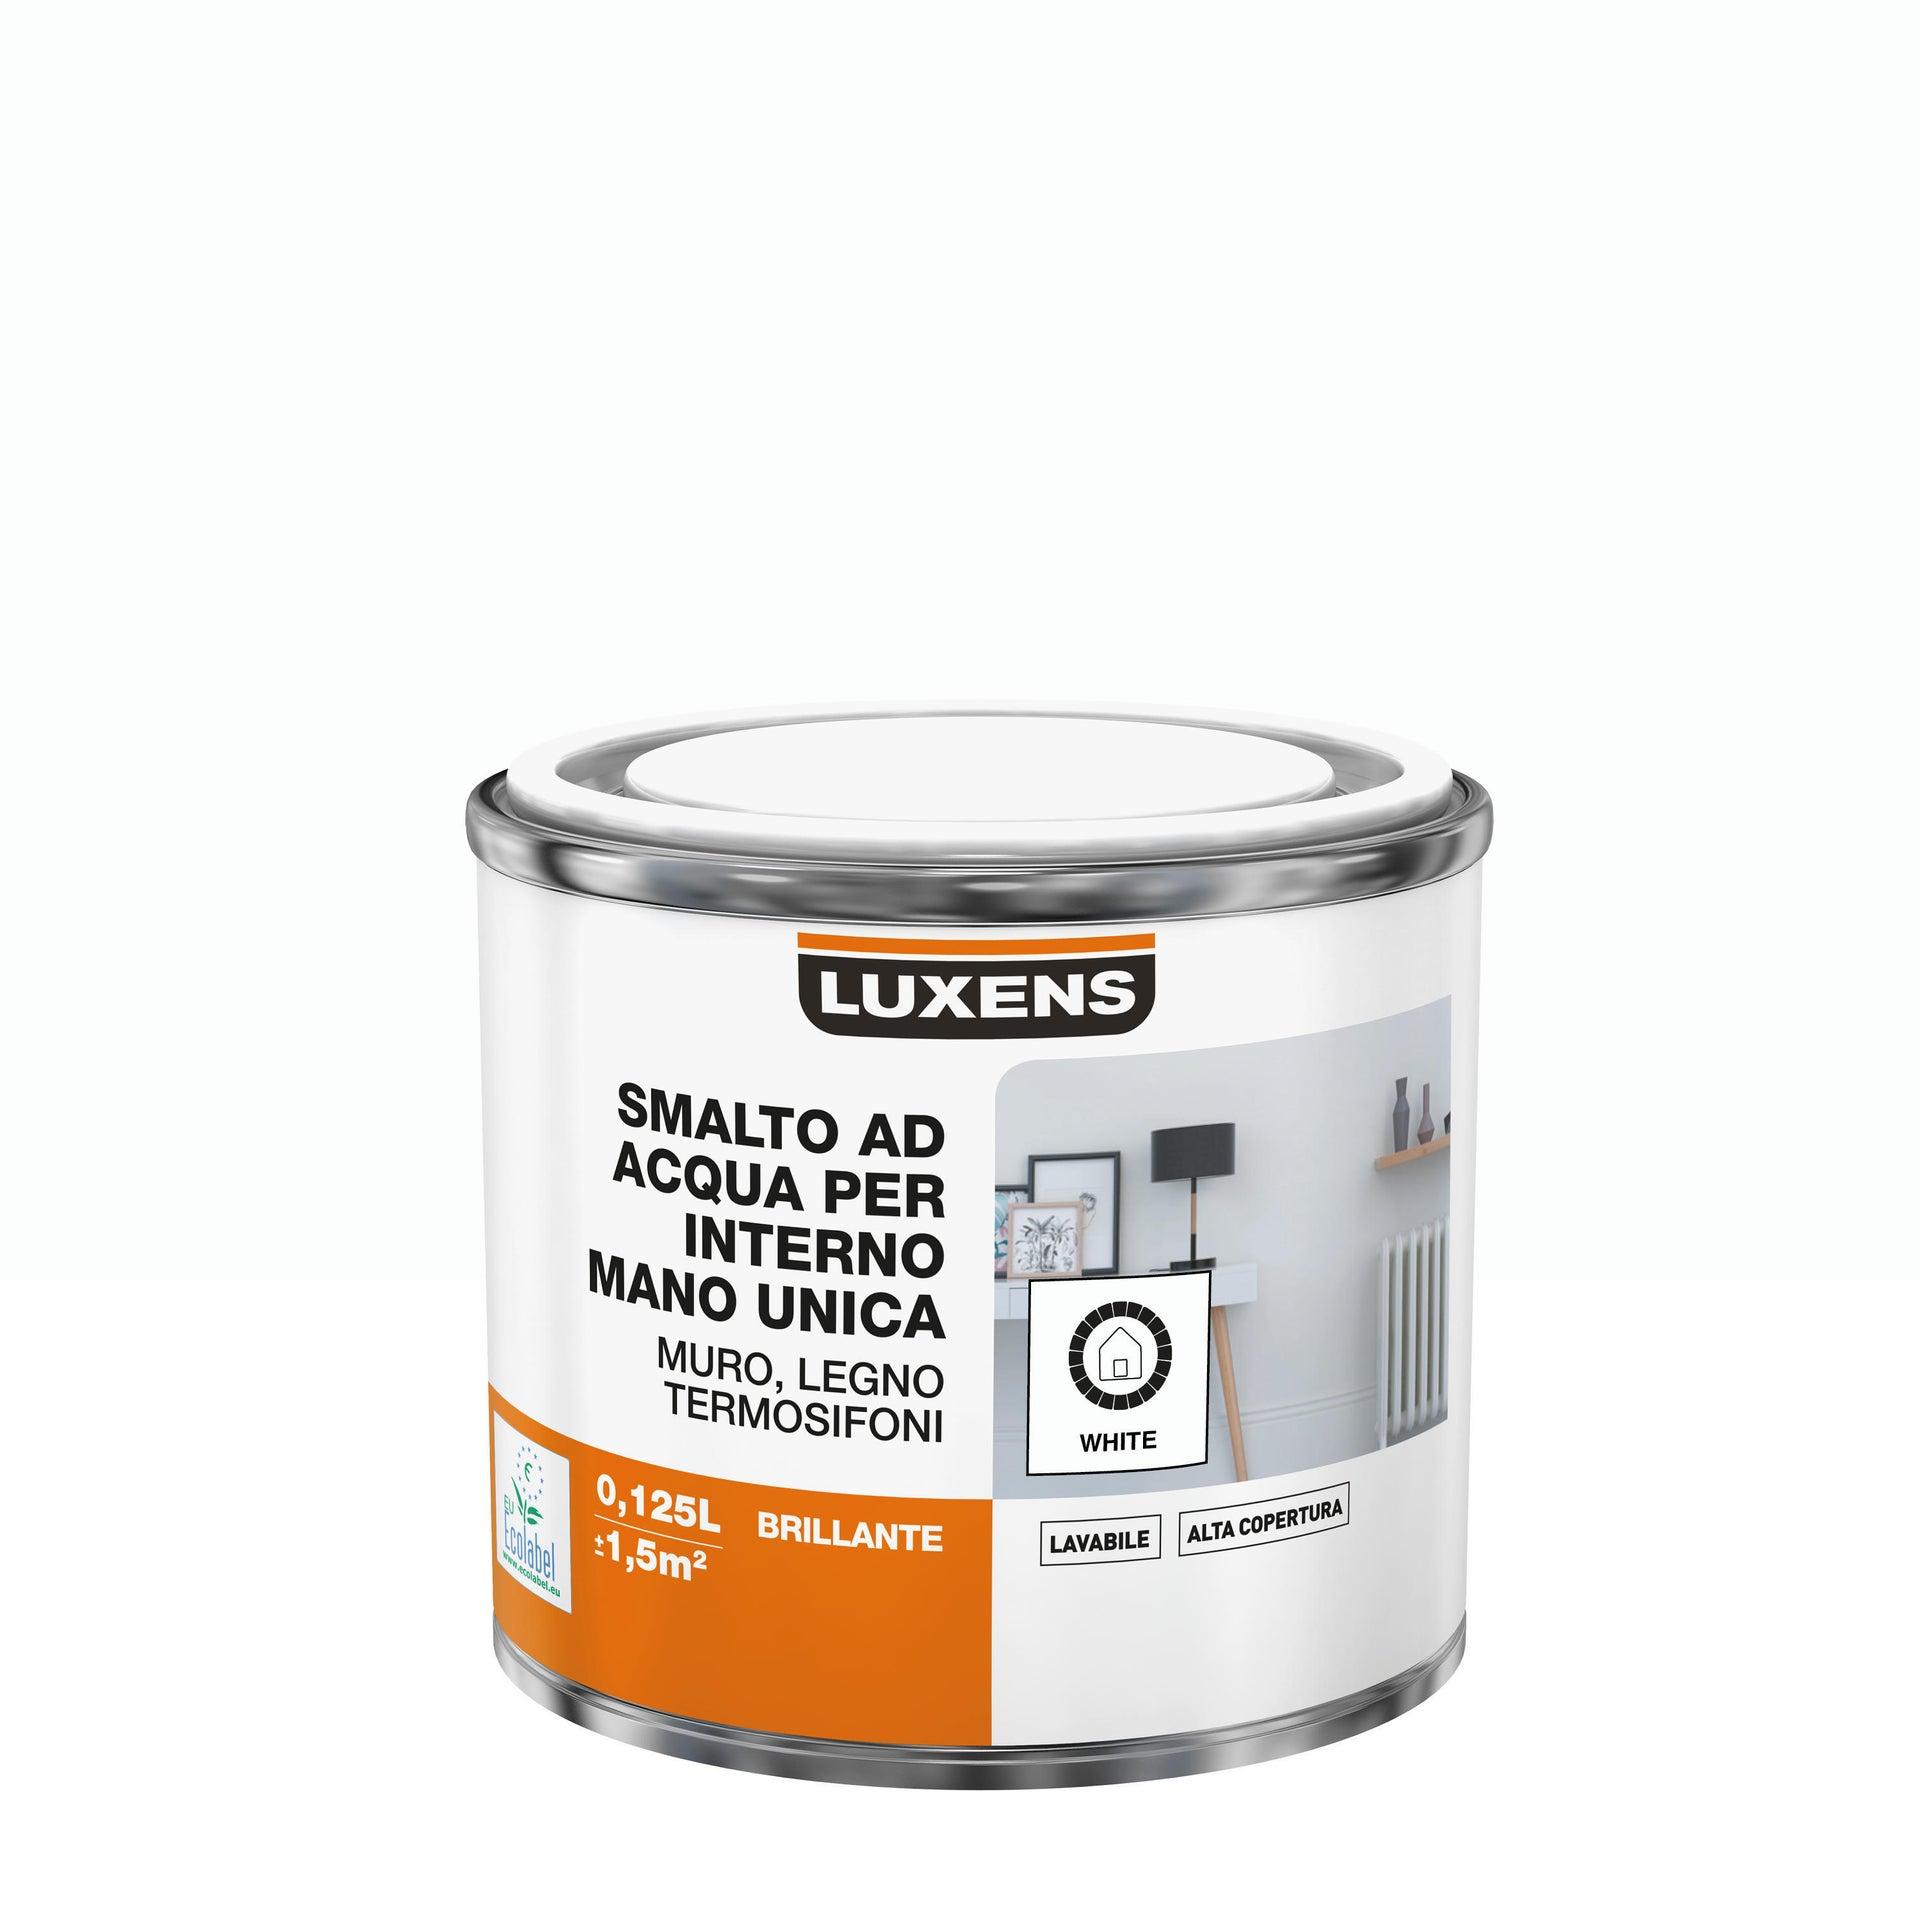 Vernice di finitura LUXENS Manounica base acqua bianco lucido 0.125 L - 3